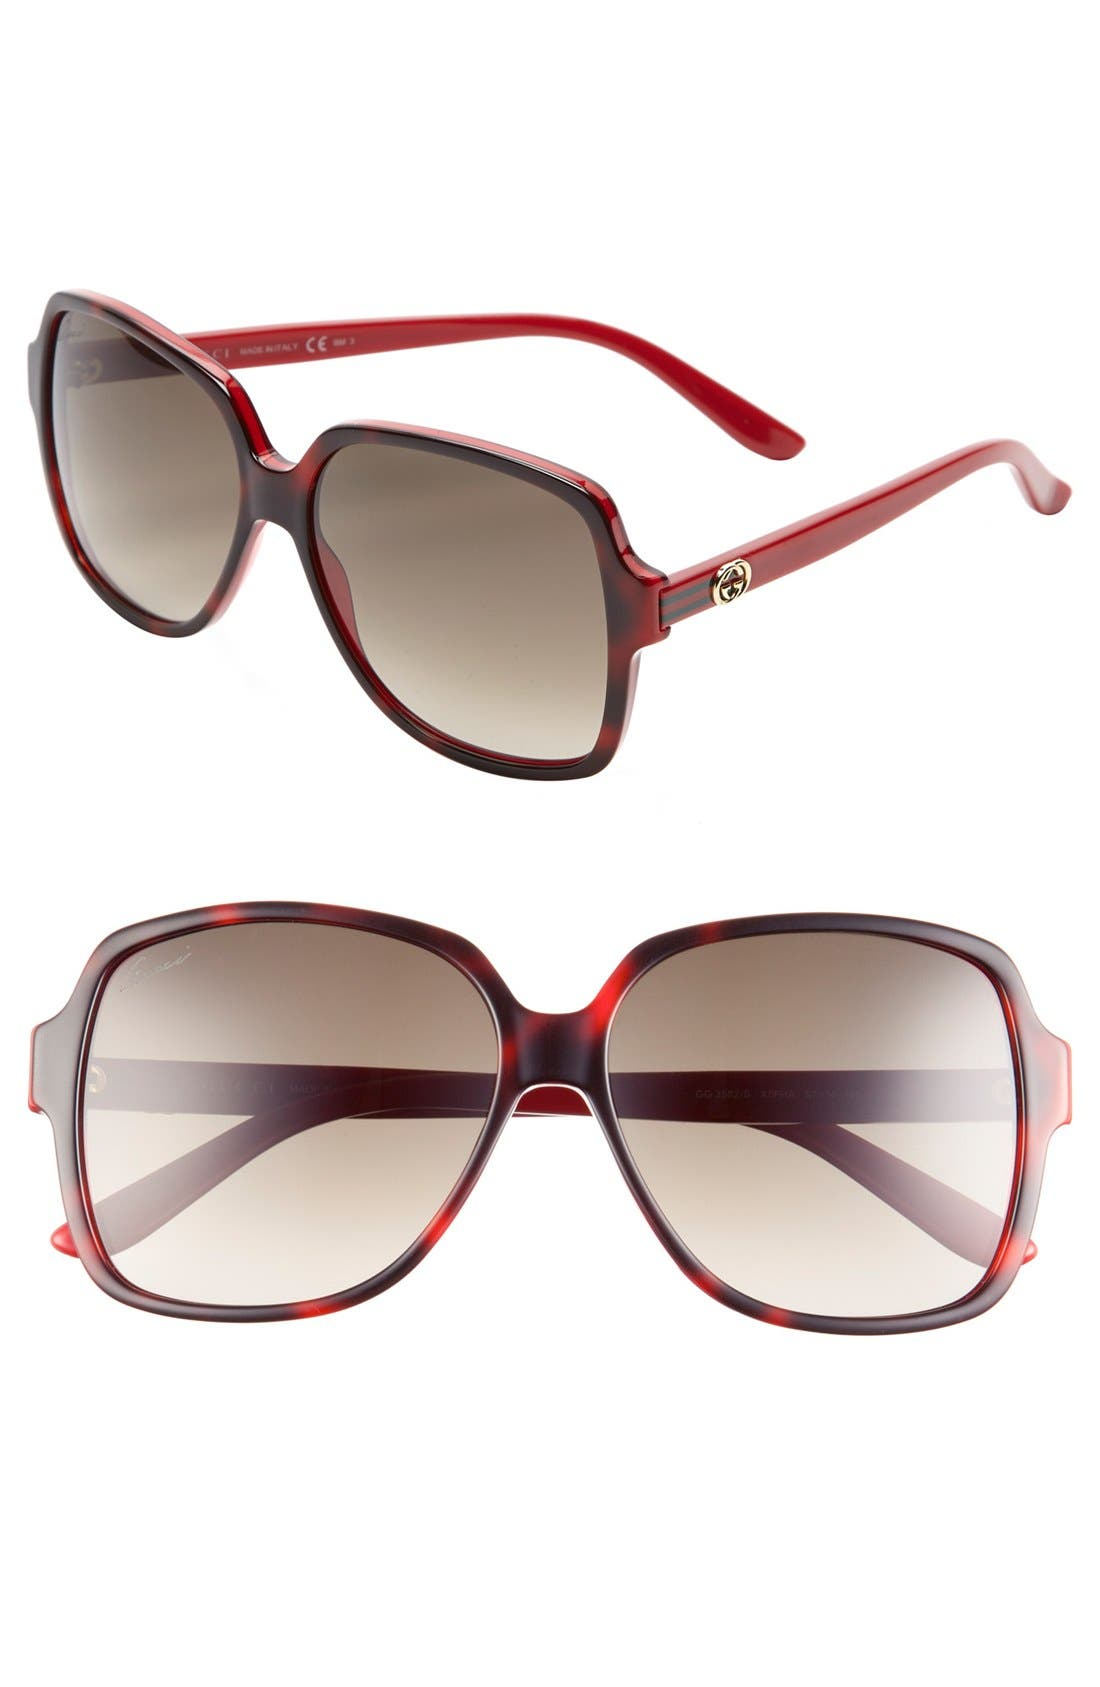 Main Image - Gucci 57mm Sunglasses